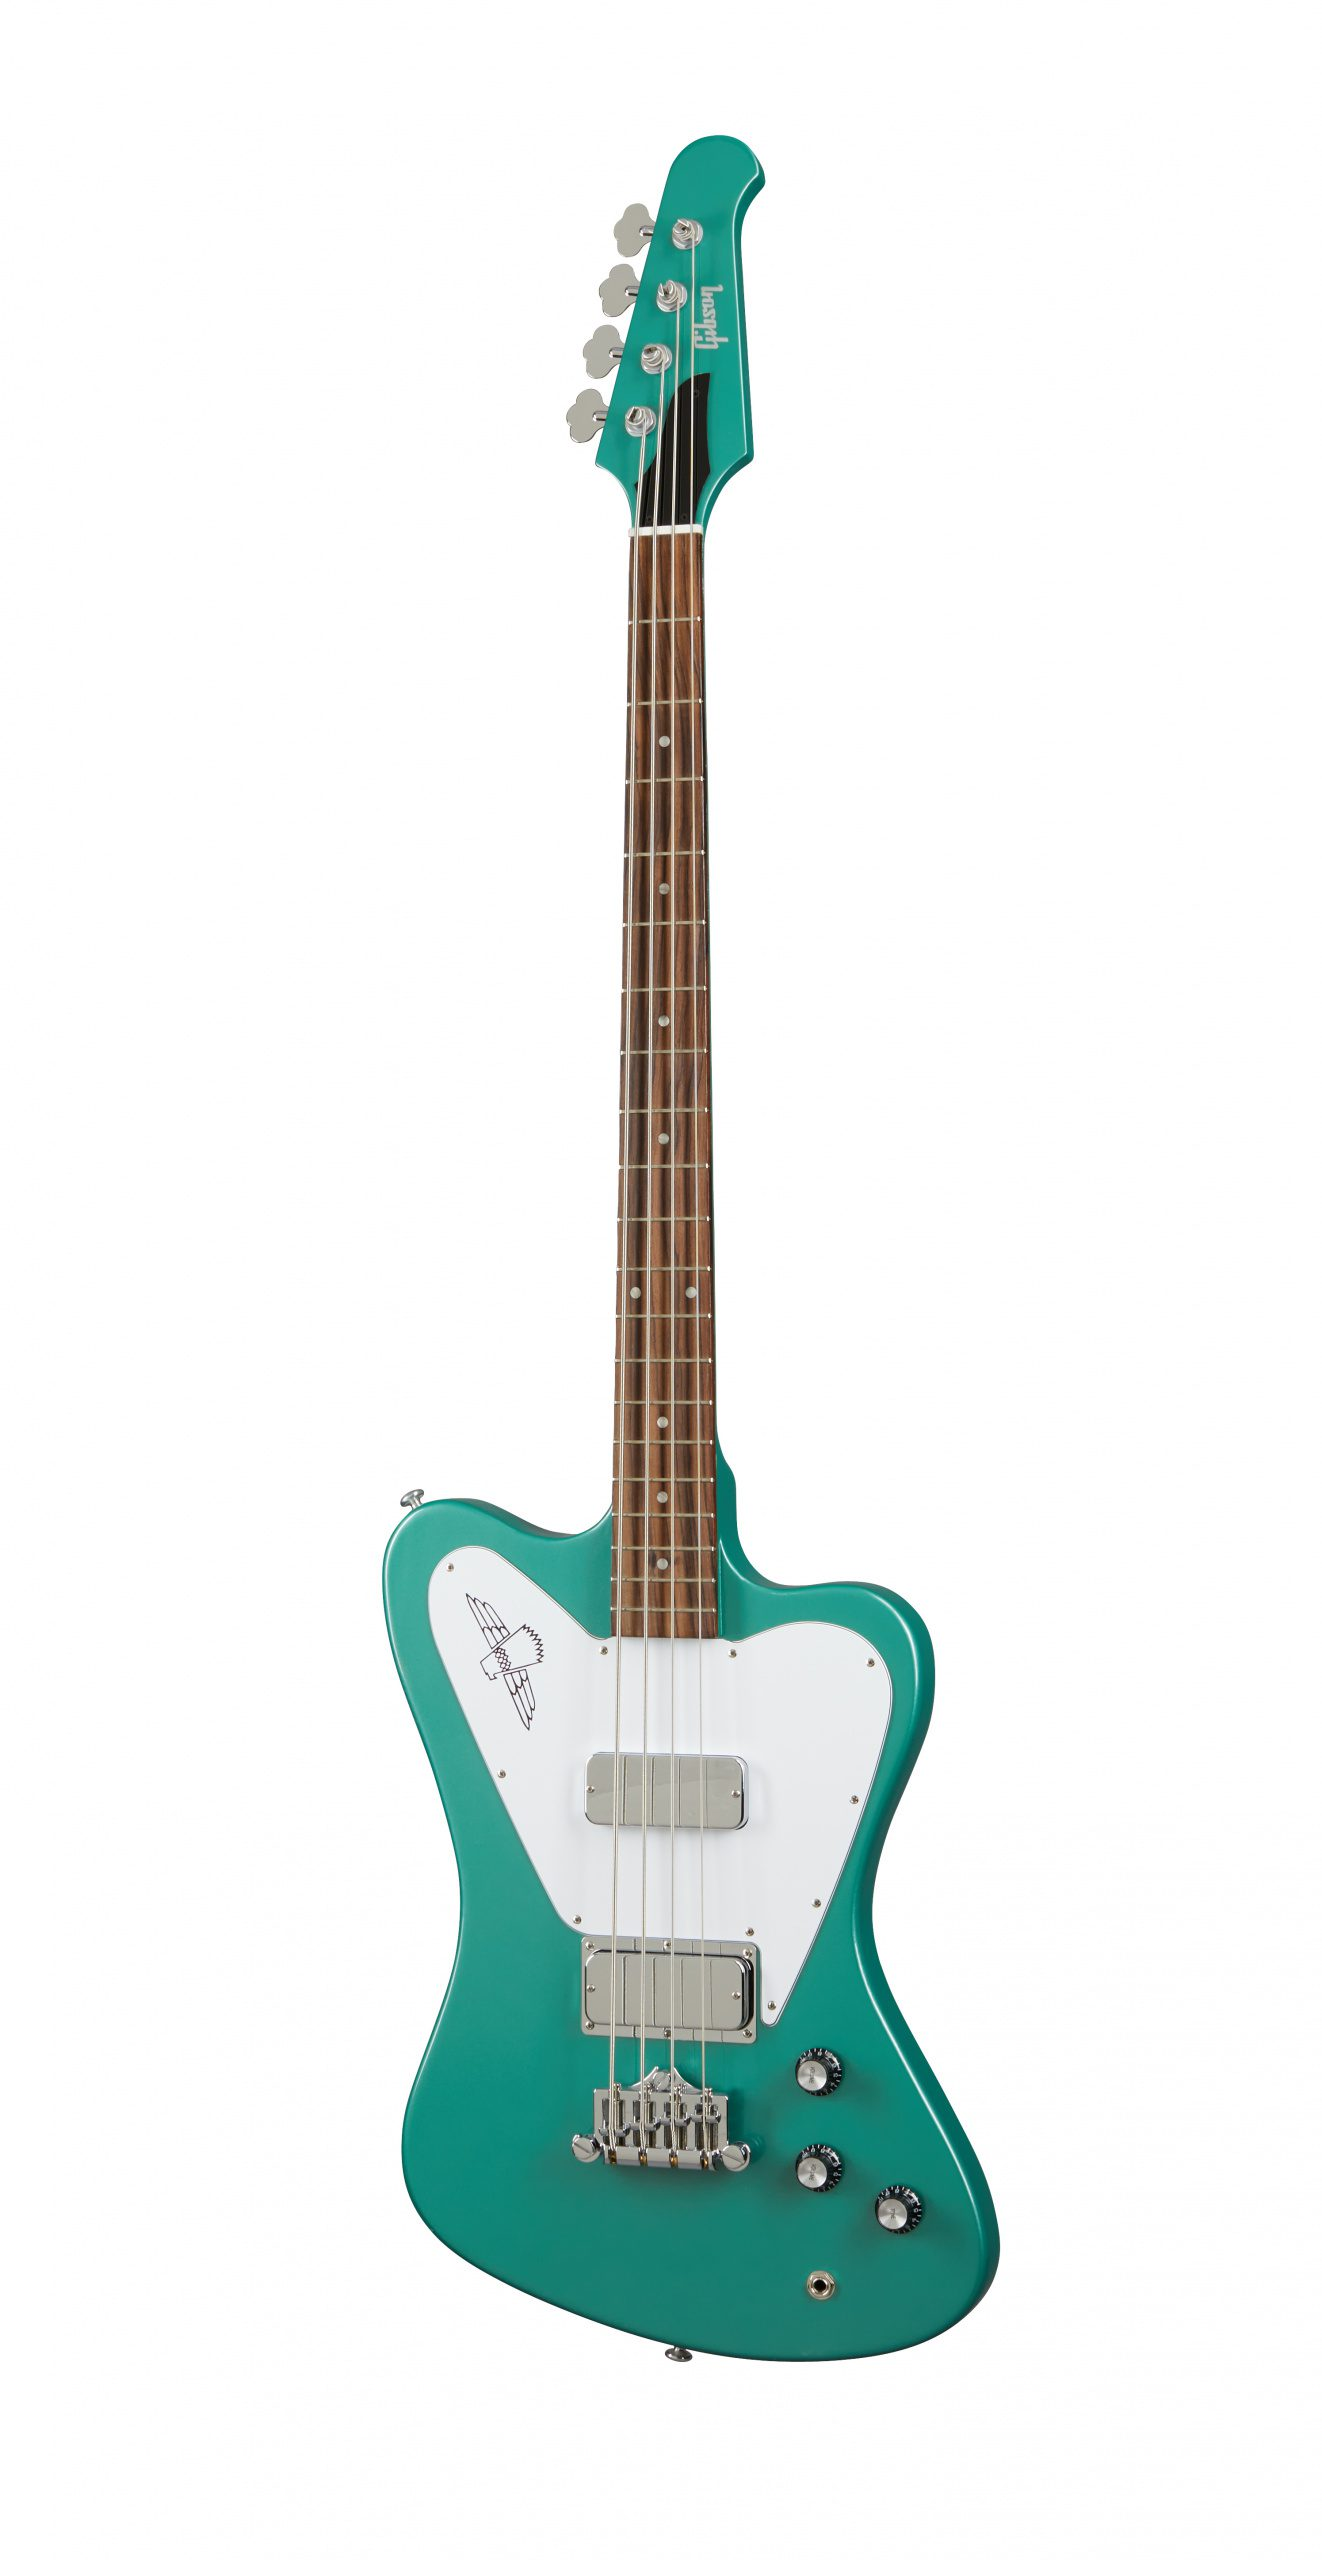 Gibson Thunderbird non-reversed Original Inverness Green